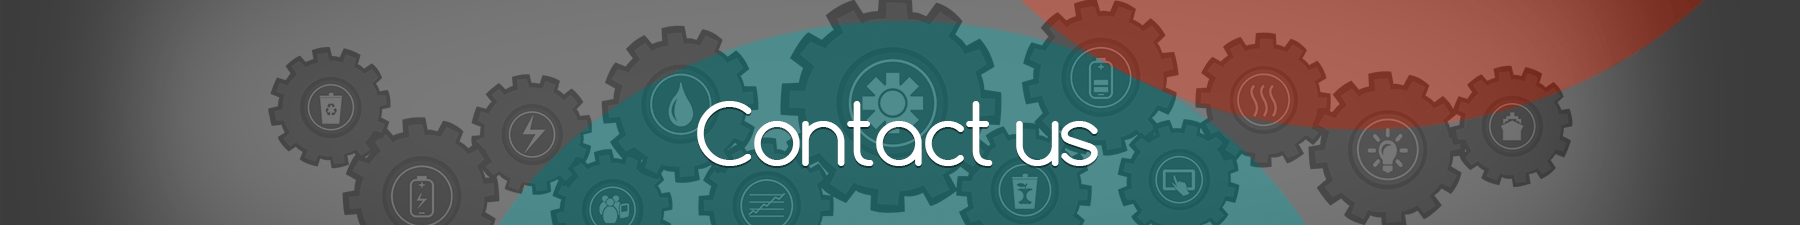 Contact-us-april-16